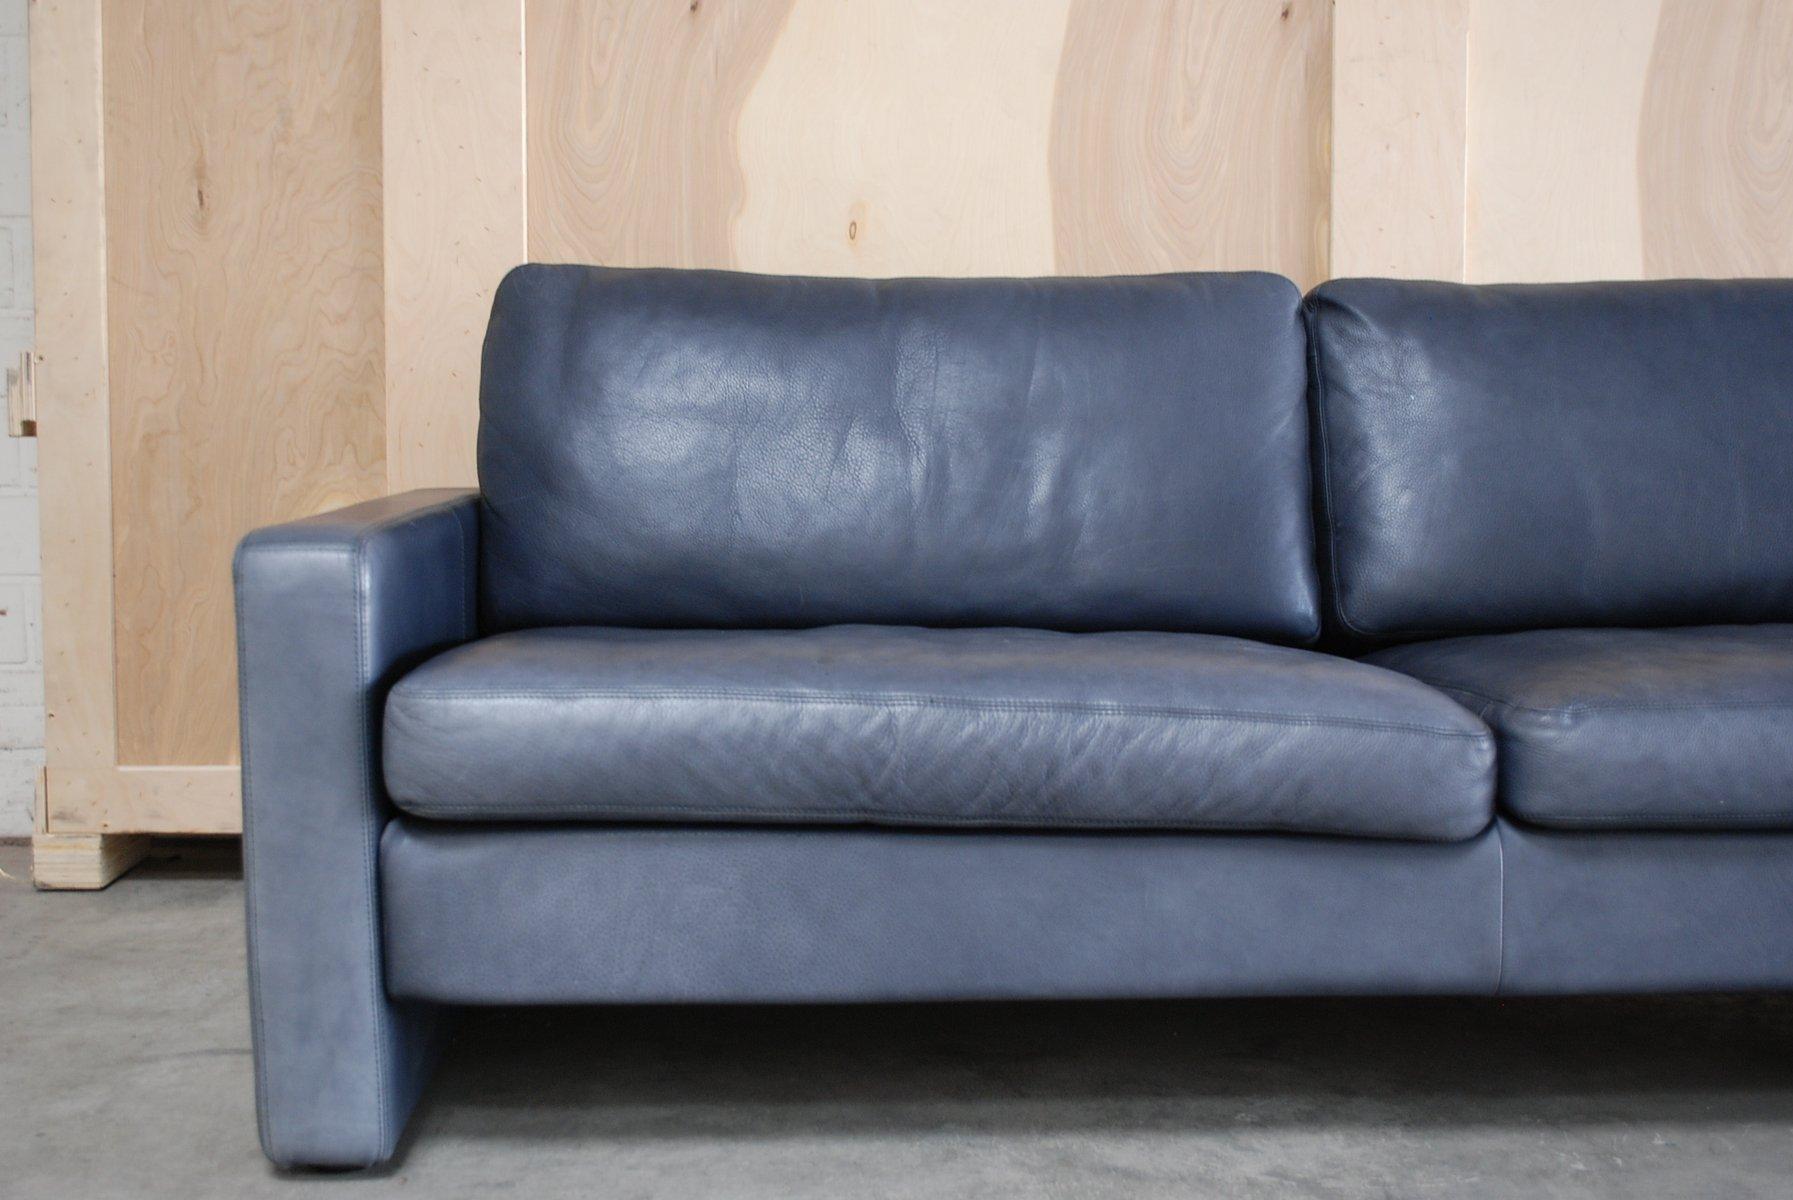 vintage conseta sofa aus blauem leder von cor bei pamono kaufen. Black Bedroom Furniture Sets. Home Design Ideas